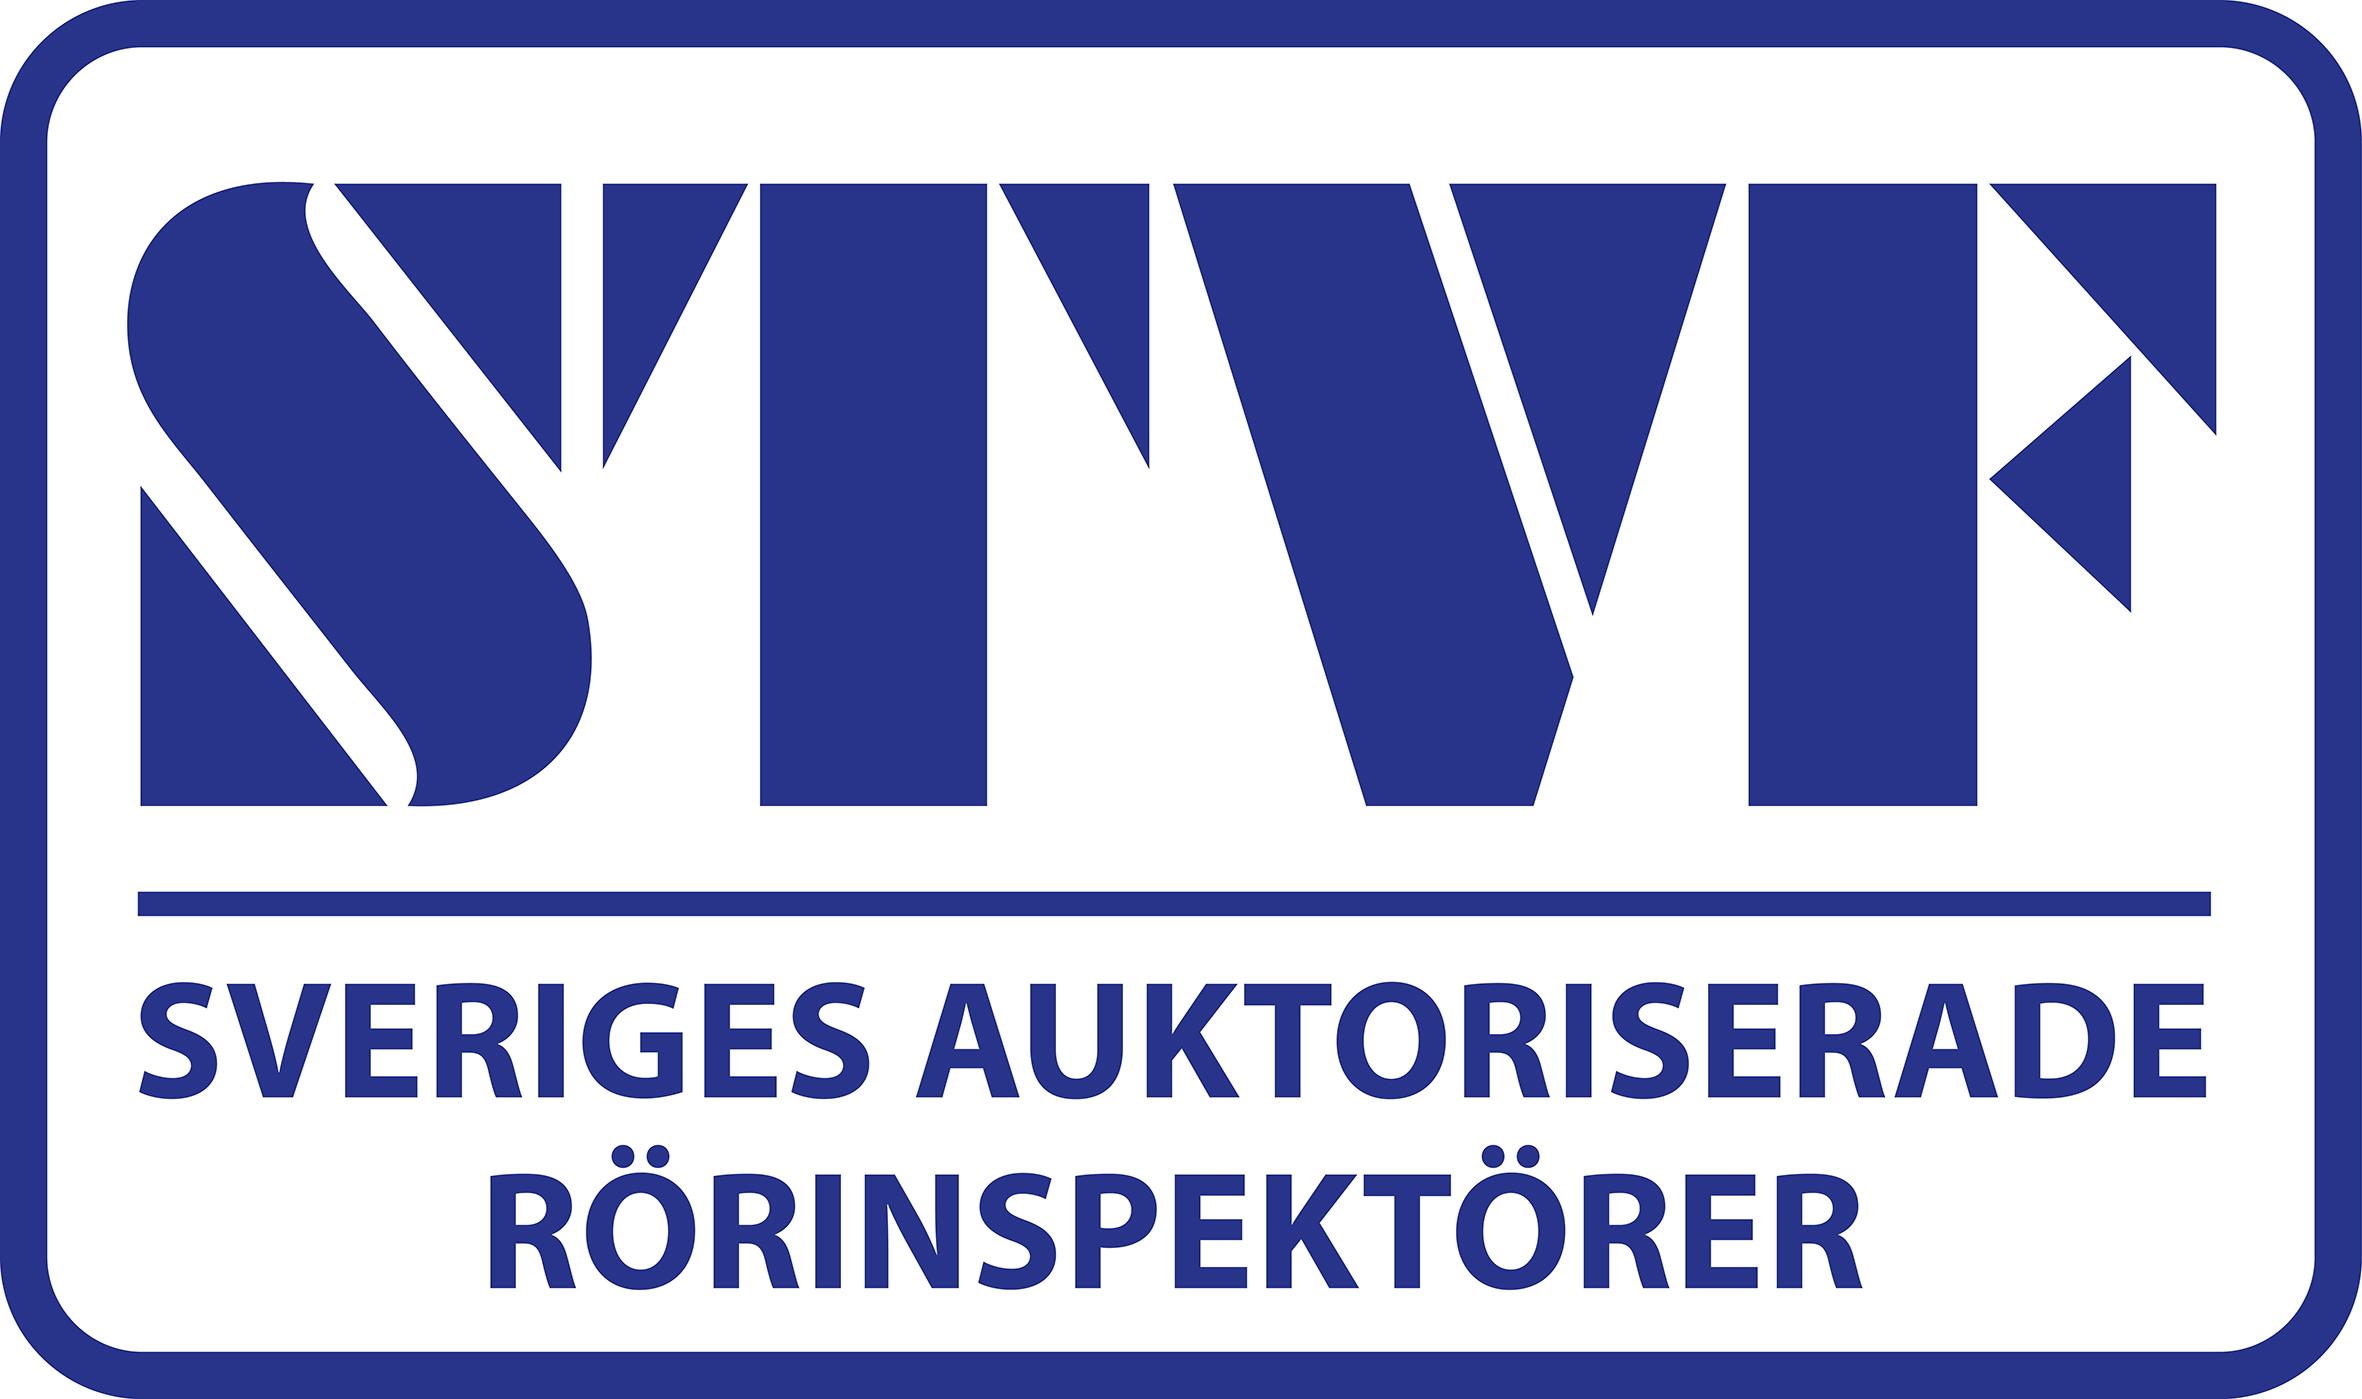 Logo-STVF-sar_small.jpg